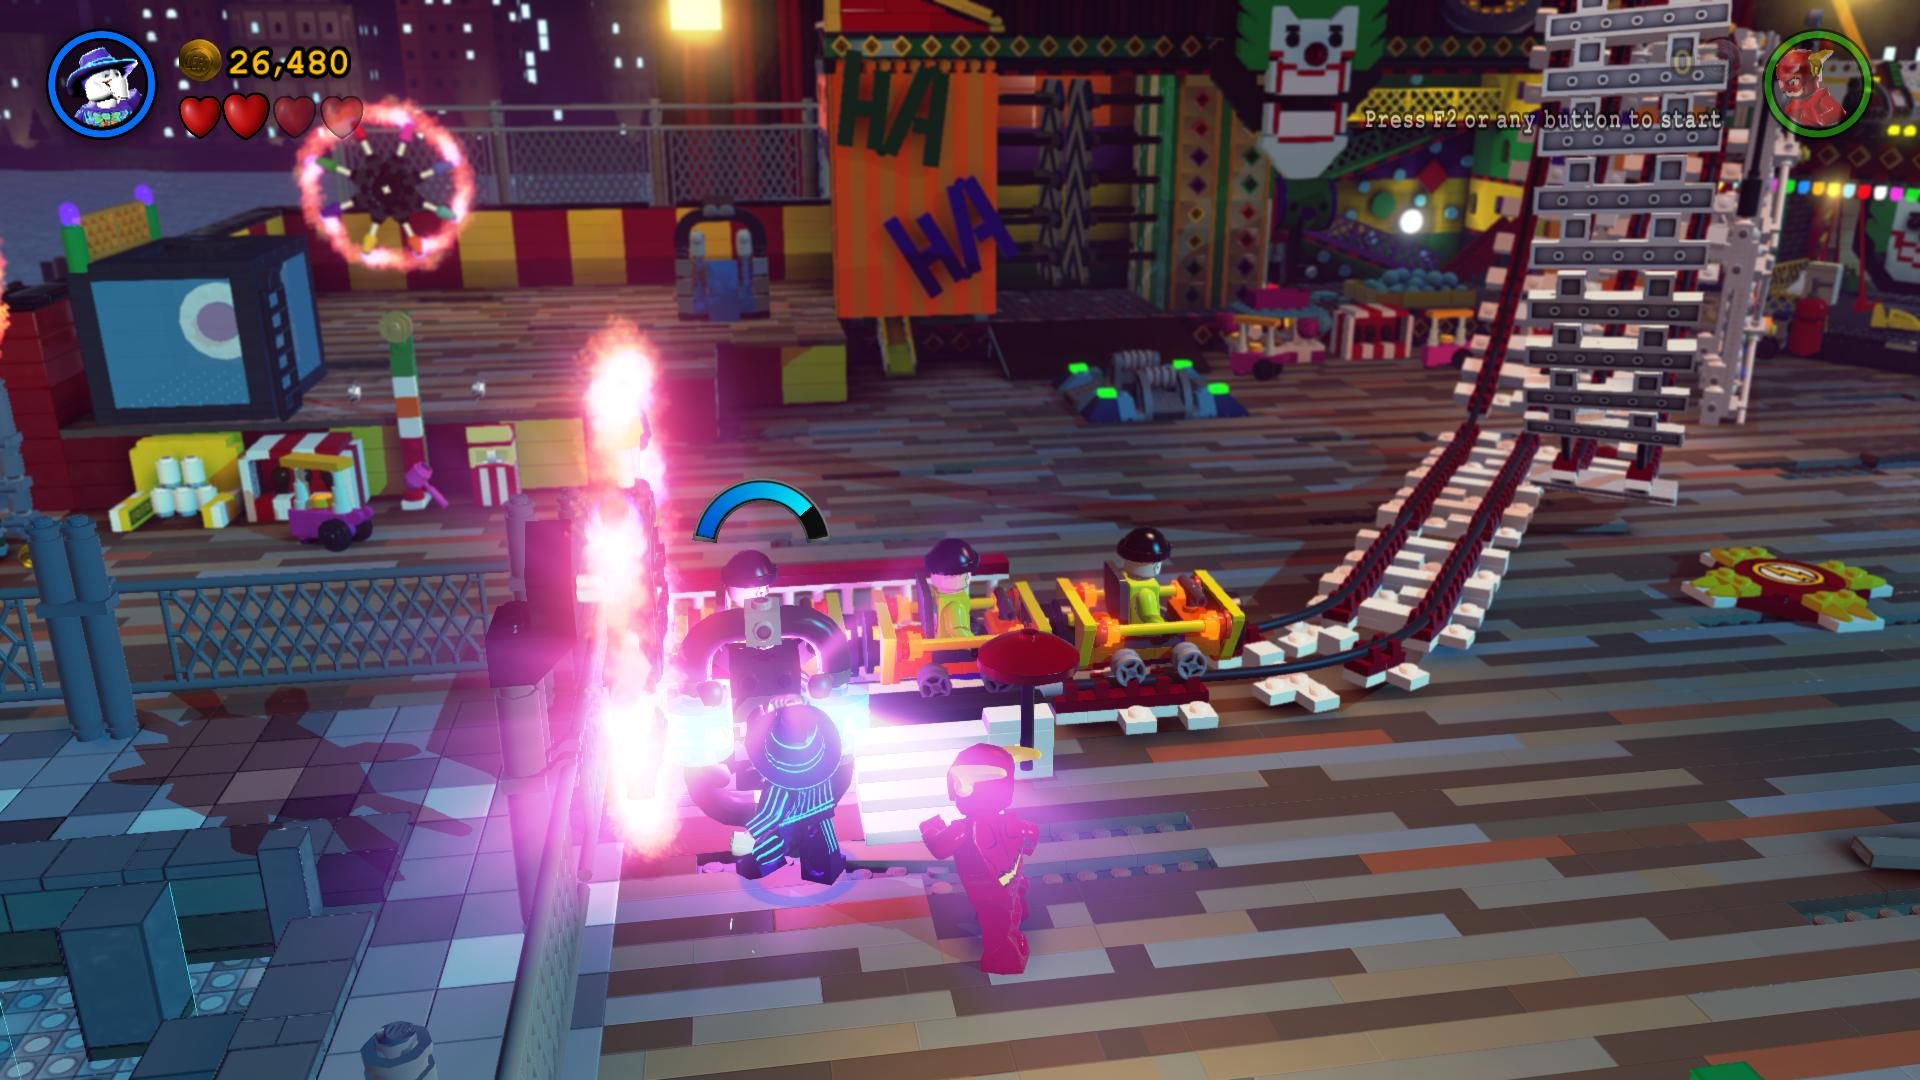 LEGO Batman 3: Beyond Gotham – netopýr znovu zasahuje 102751